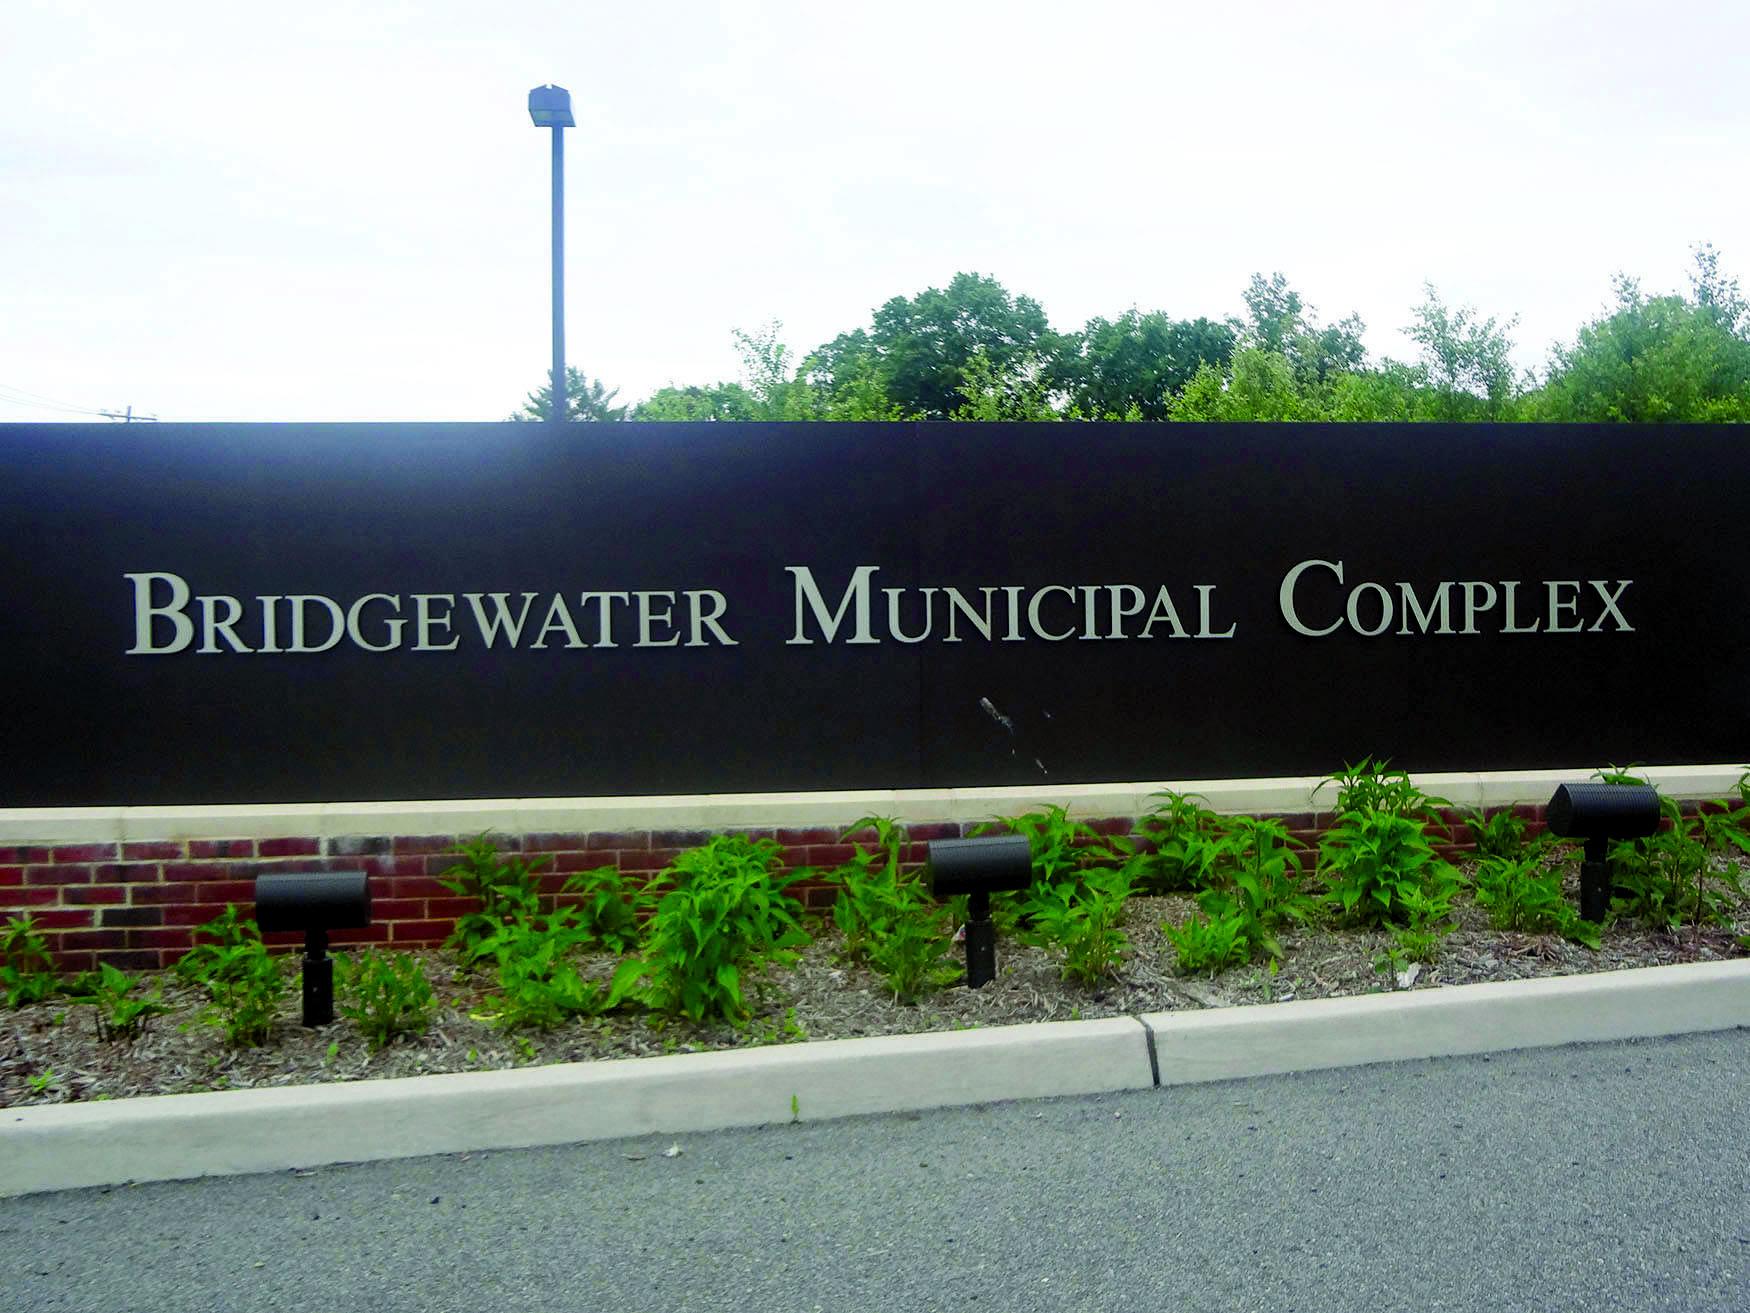 bdc41a0e8157569db00e_Bridgewater_municipal.jpg